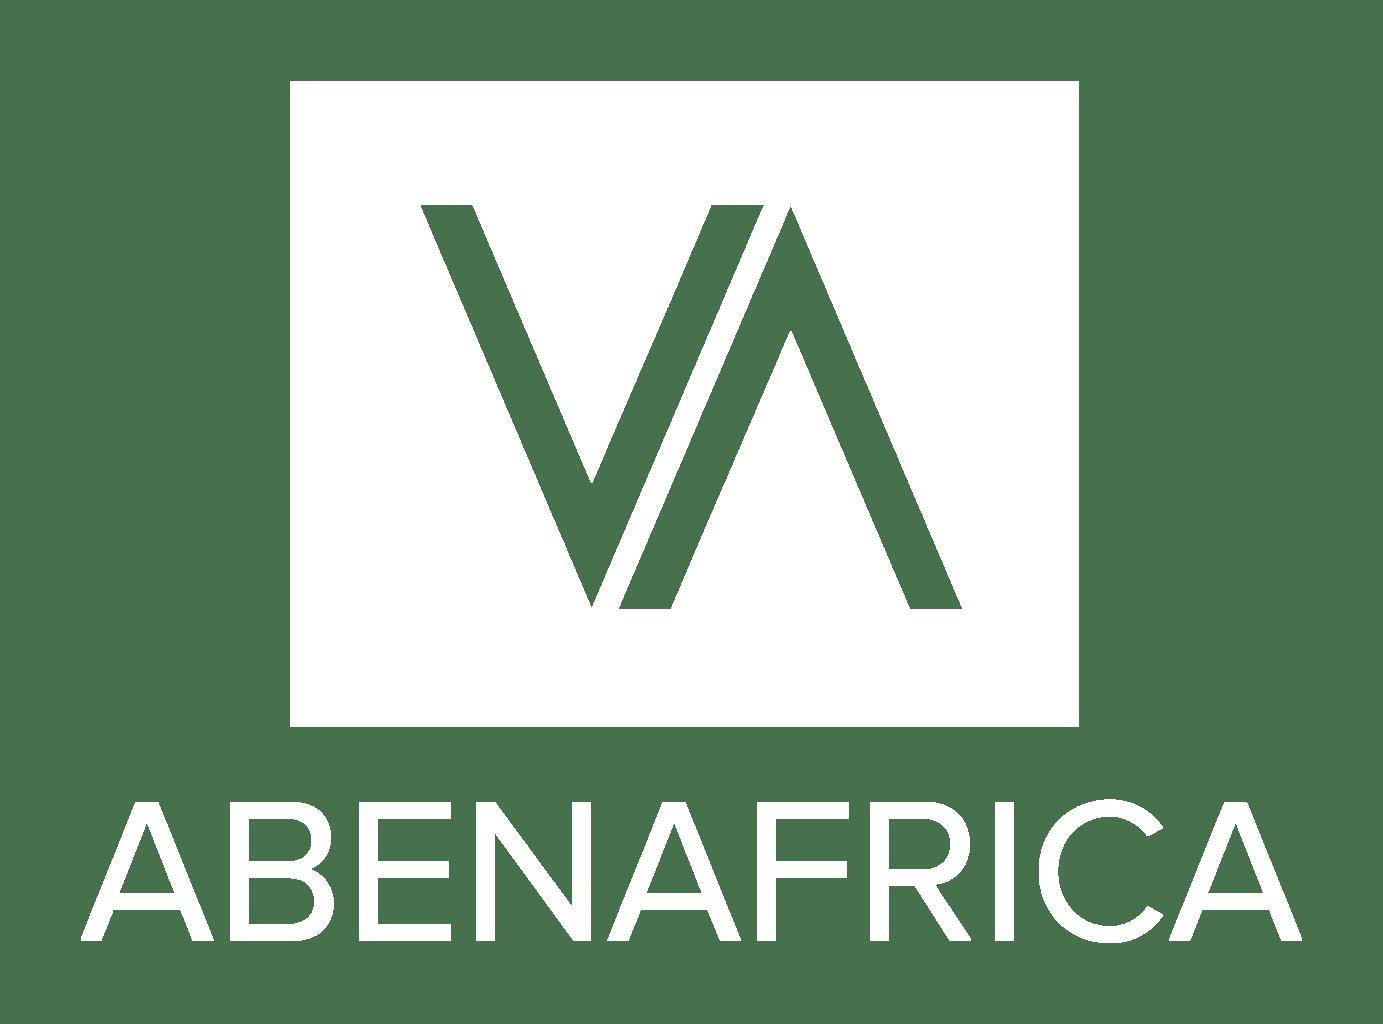 Abenafrica